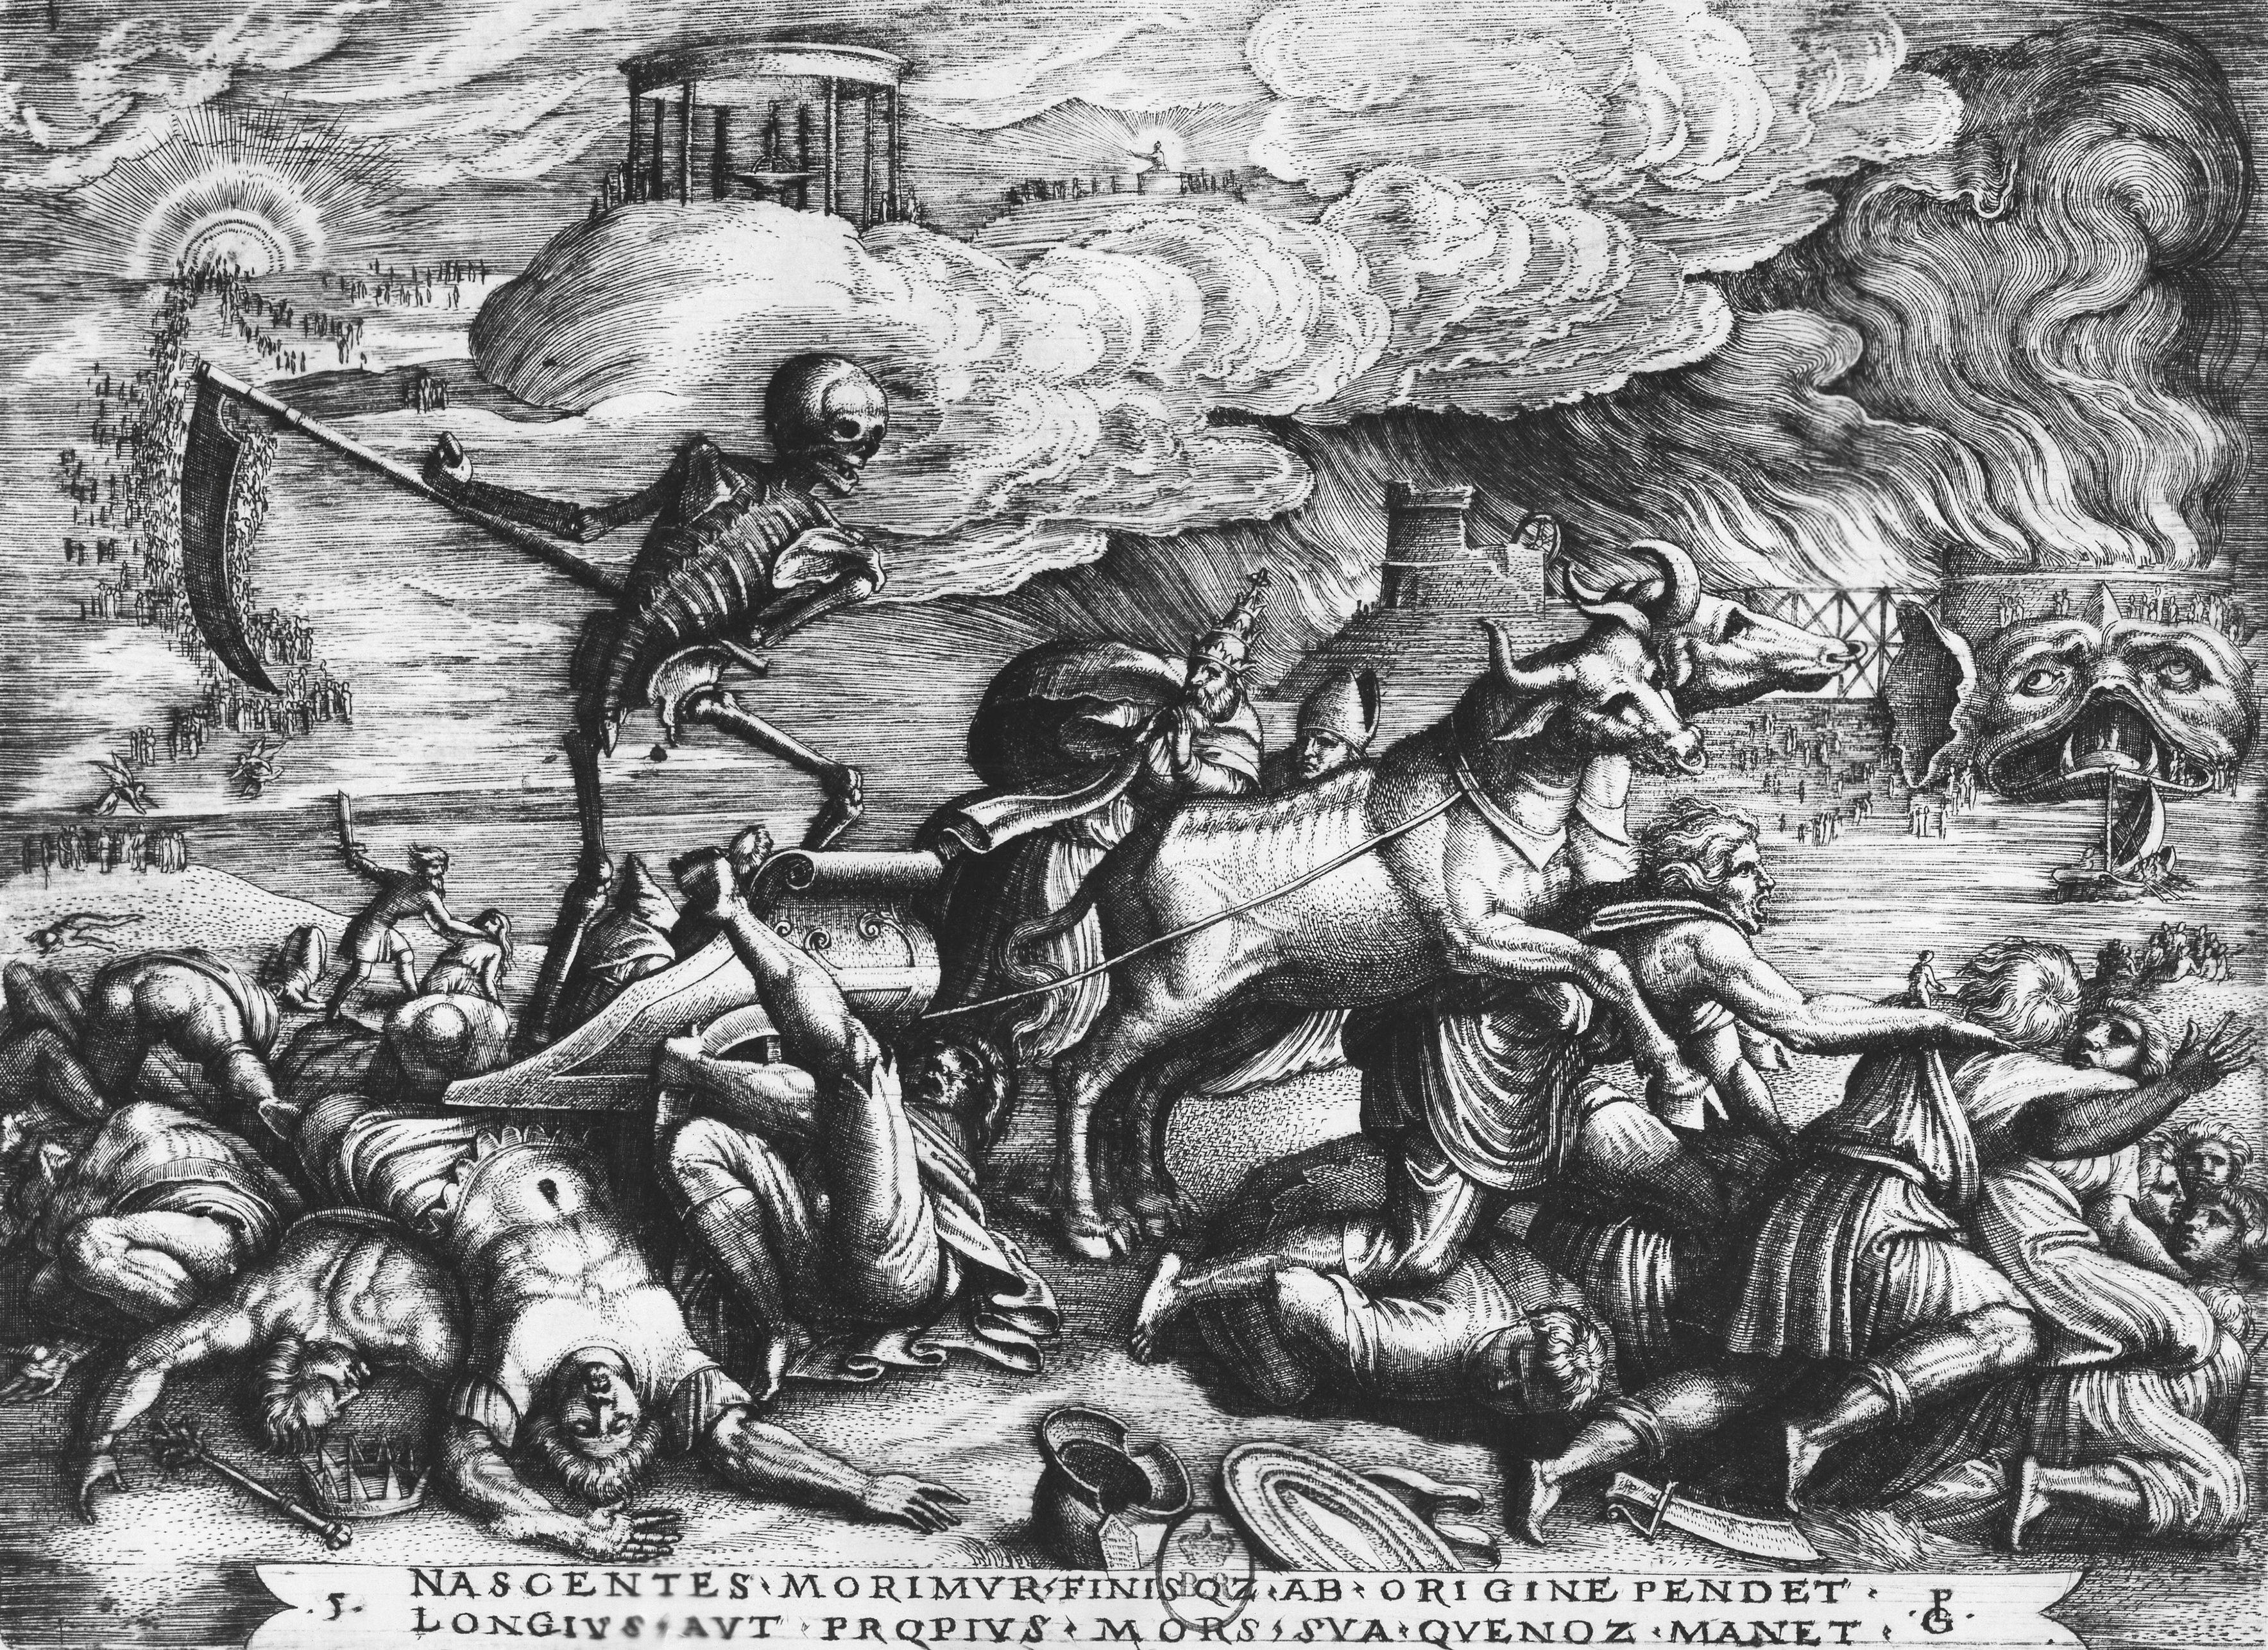 Drawn scythe european A to Renaissance Humanism Guide